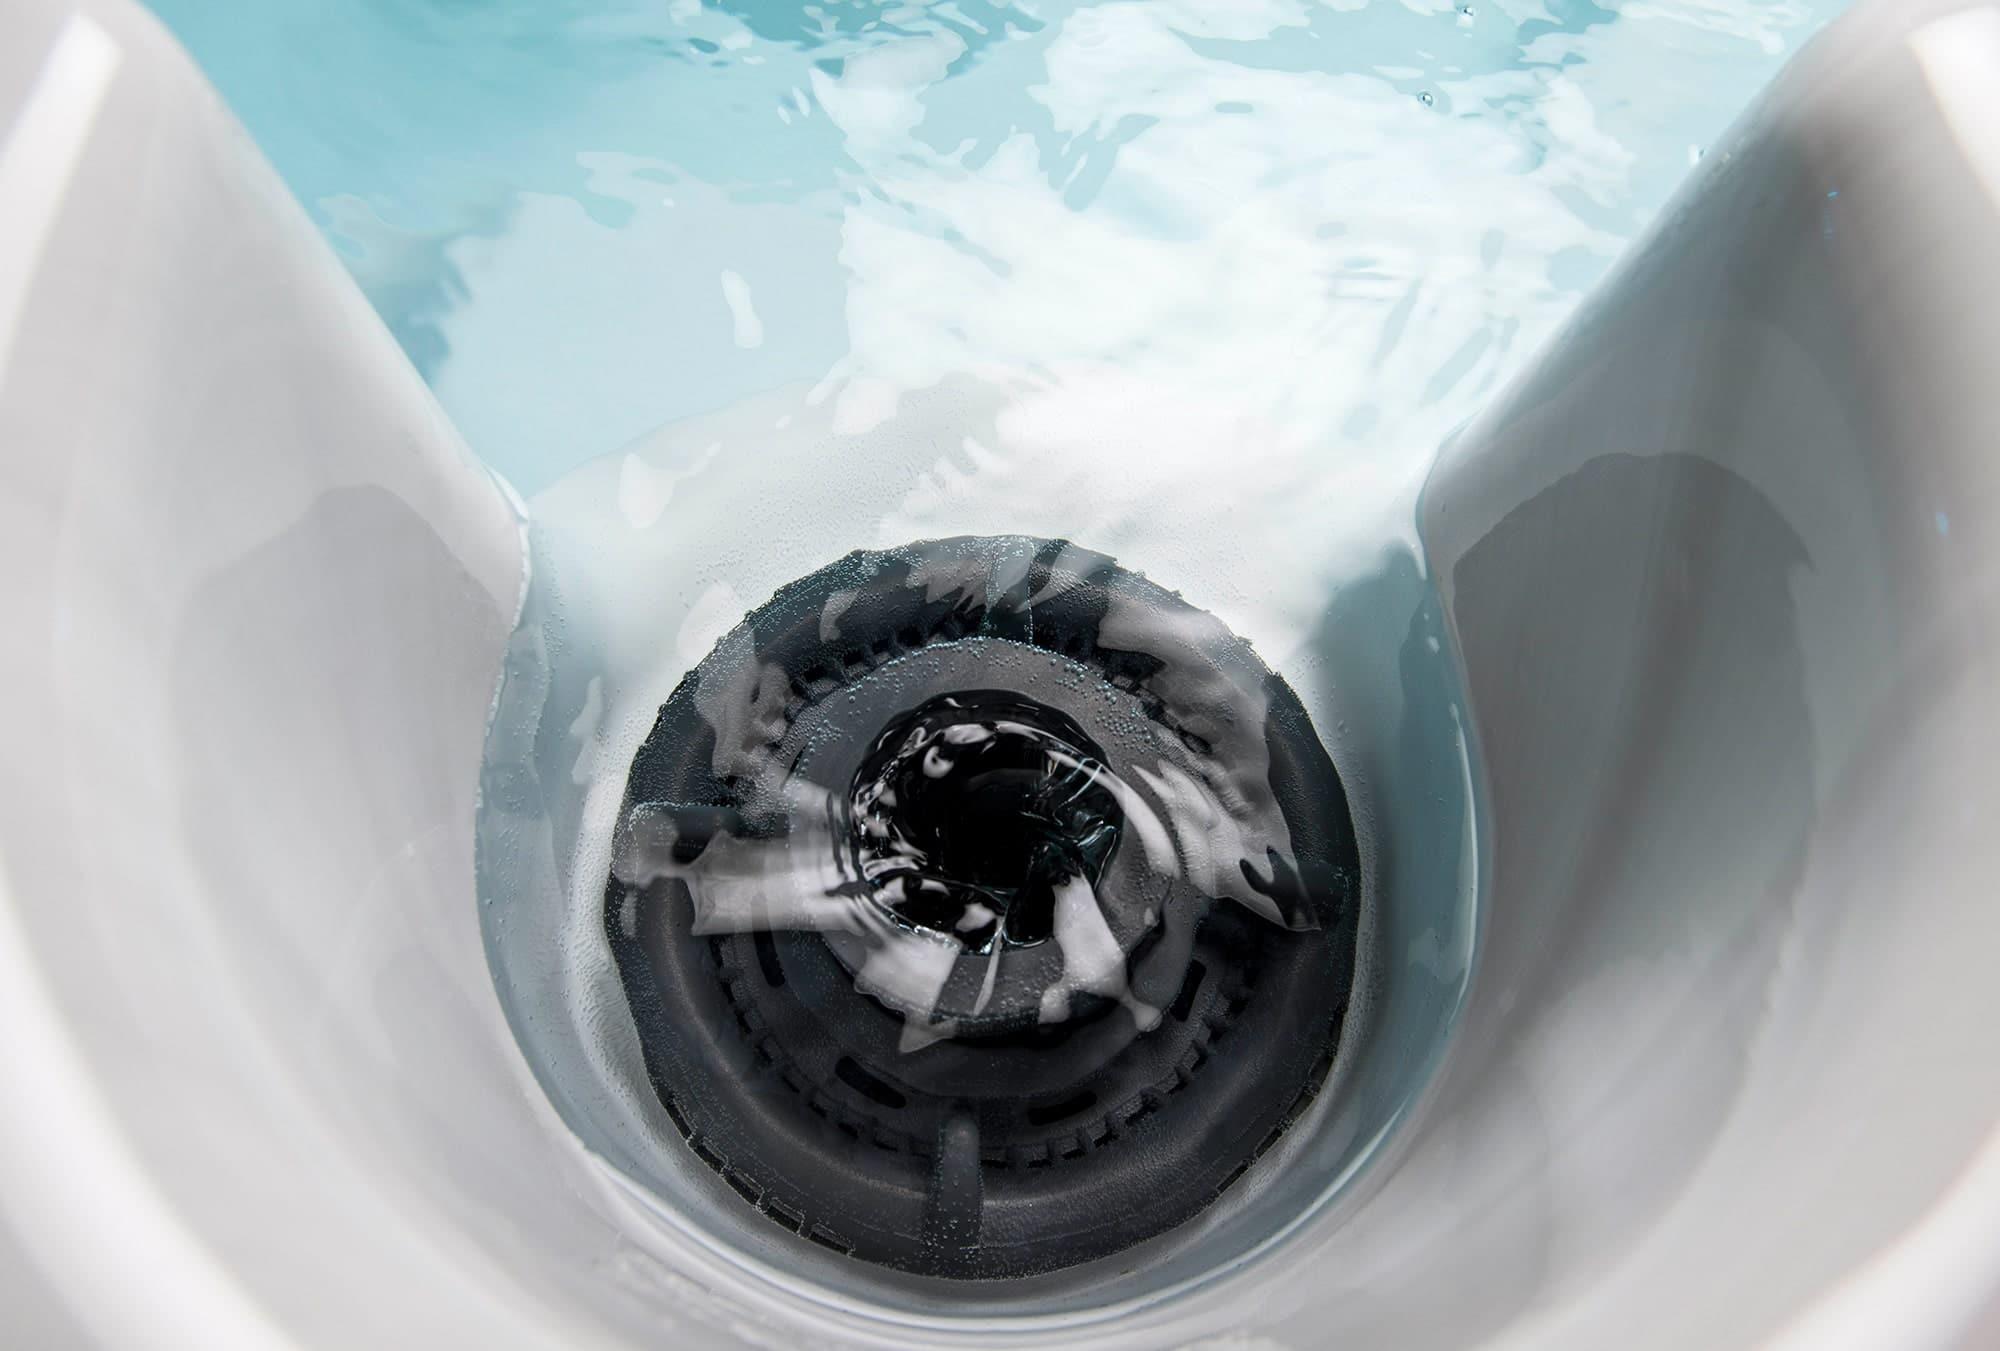 Sundance-Spa-680-Filter.jpg